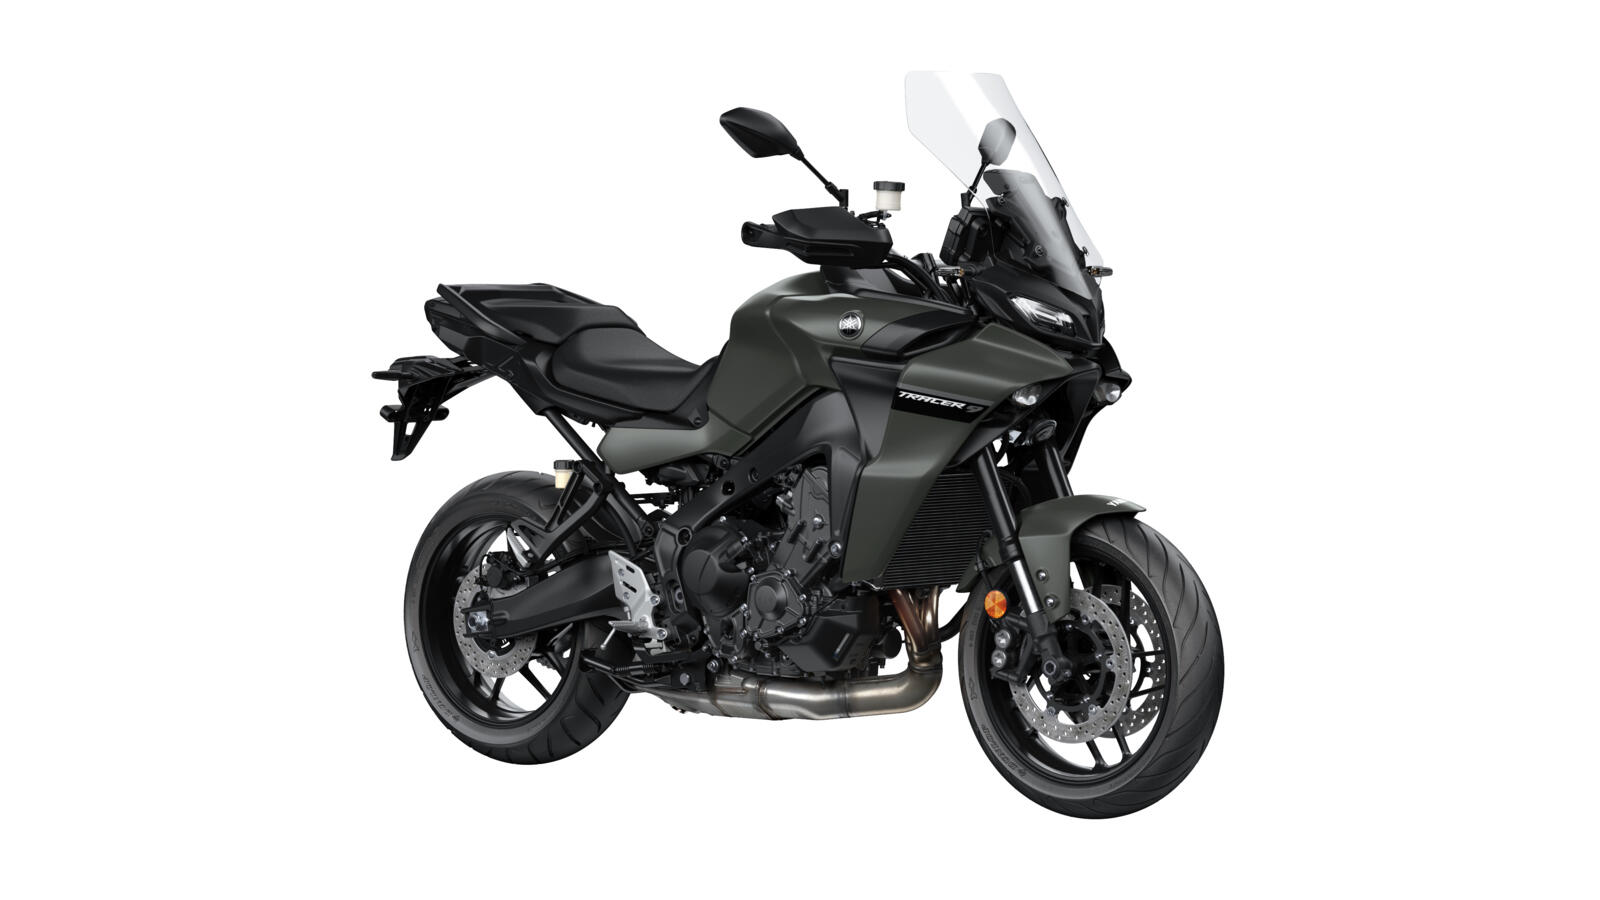 Yamaha Tracer 9 nu bestellen